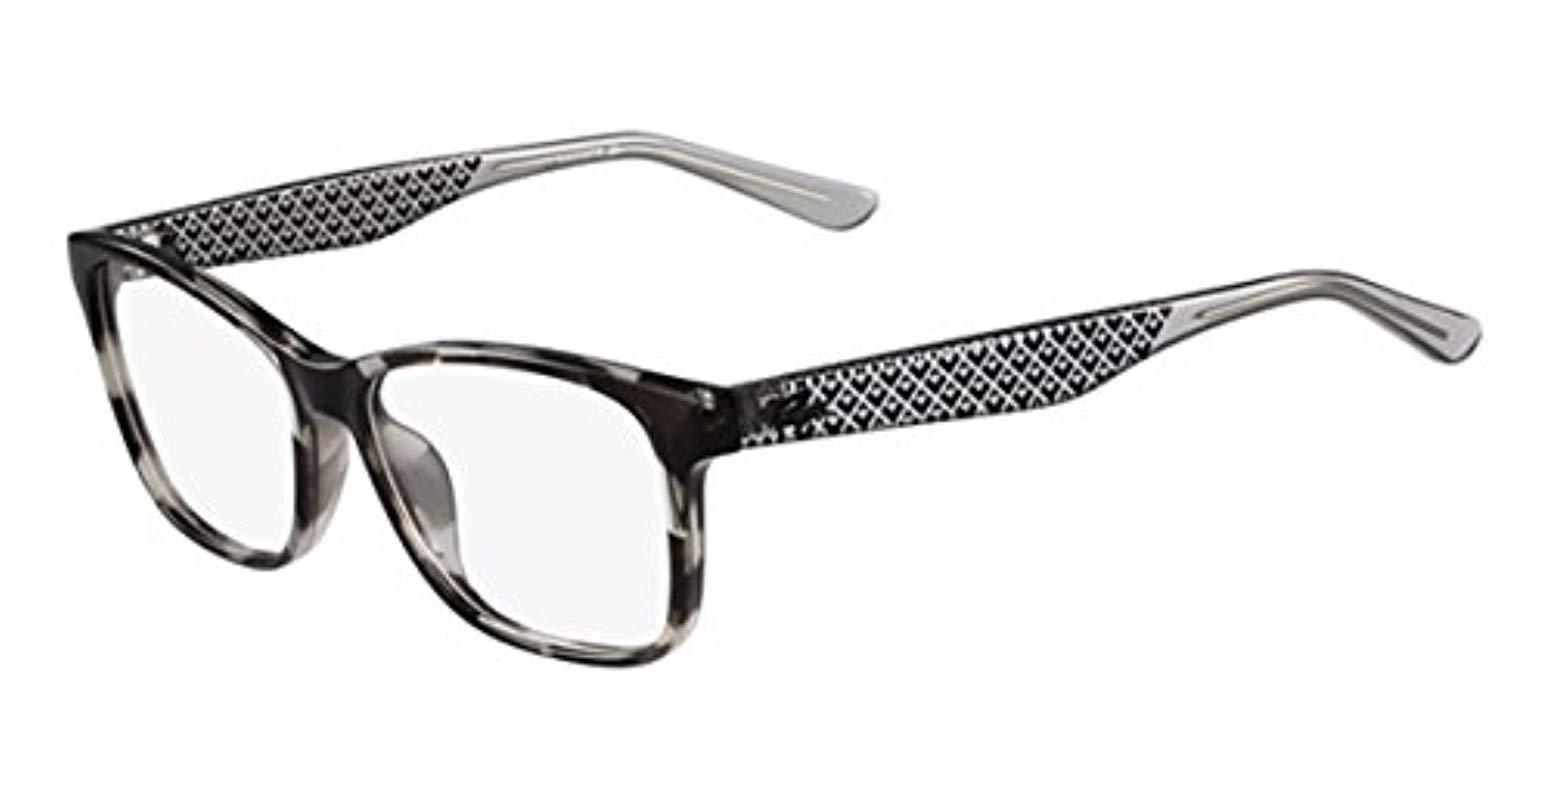 f4a36904acb4 Lacoste L2774 035 54 Optical Frames